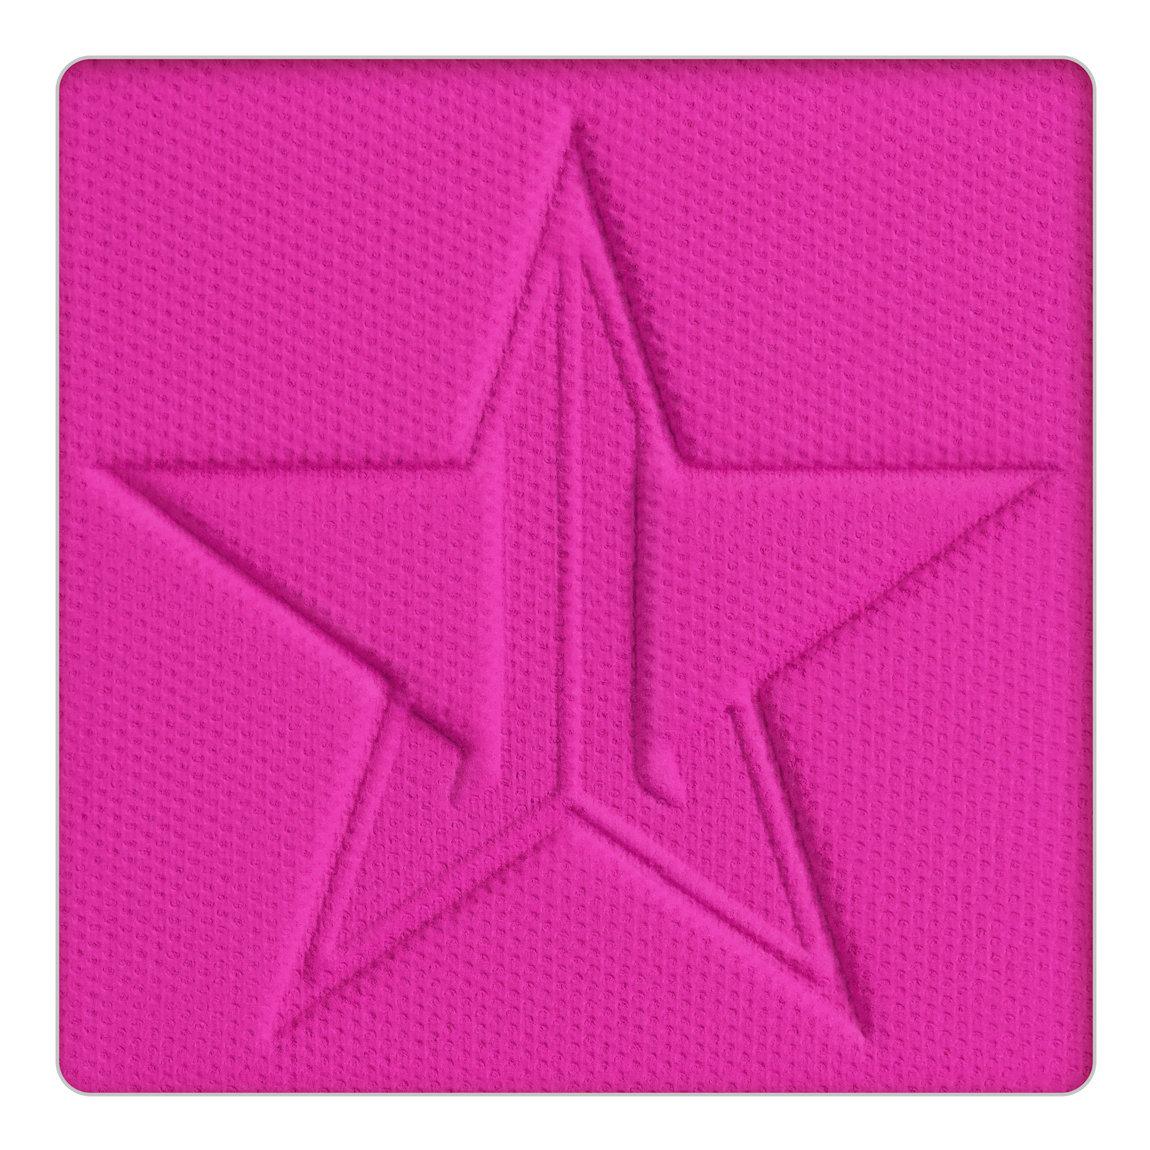 Jeffree Star Cosmetics Artistry Singles Cavity alternative view 1.